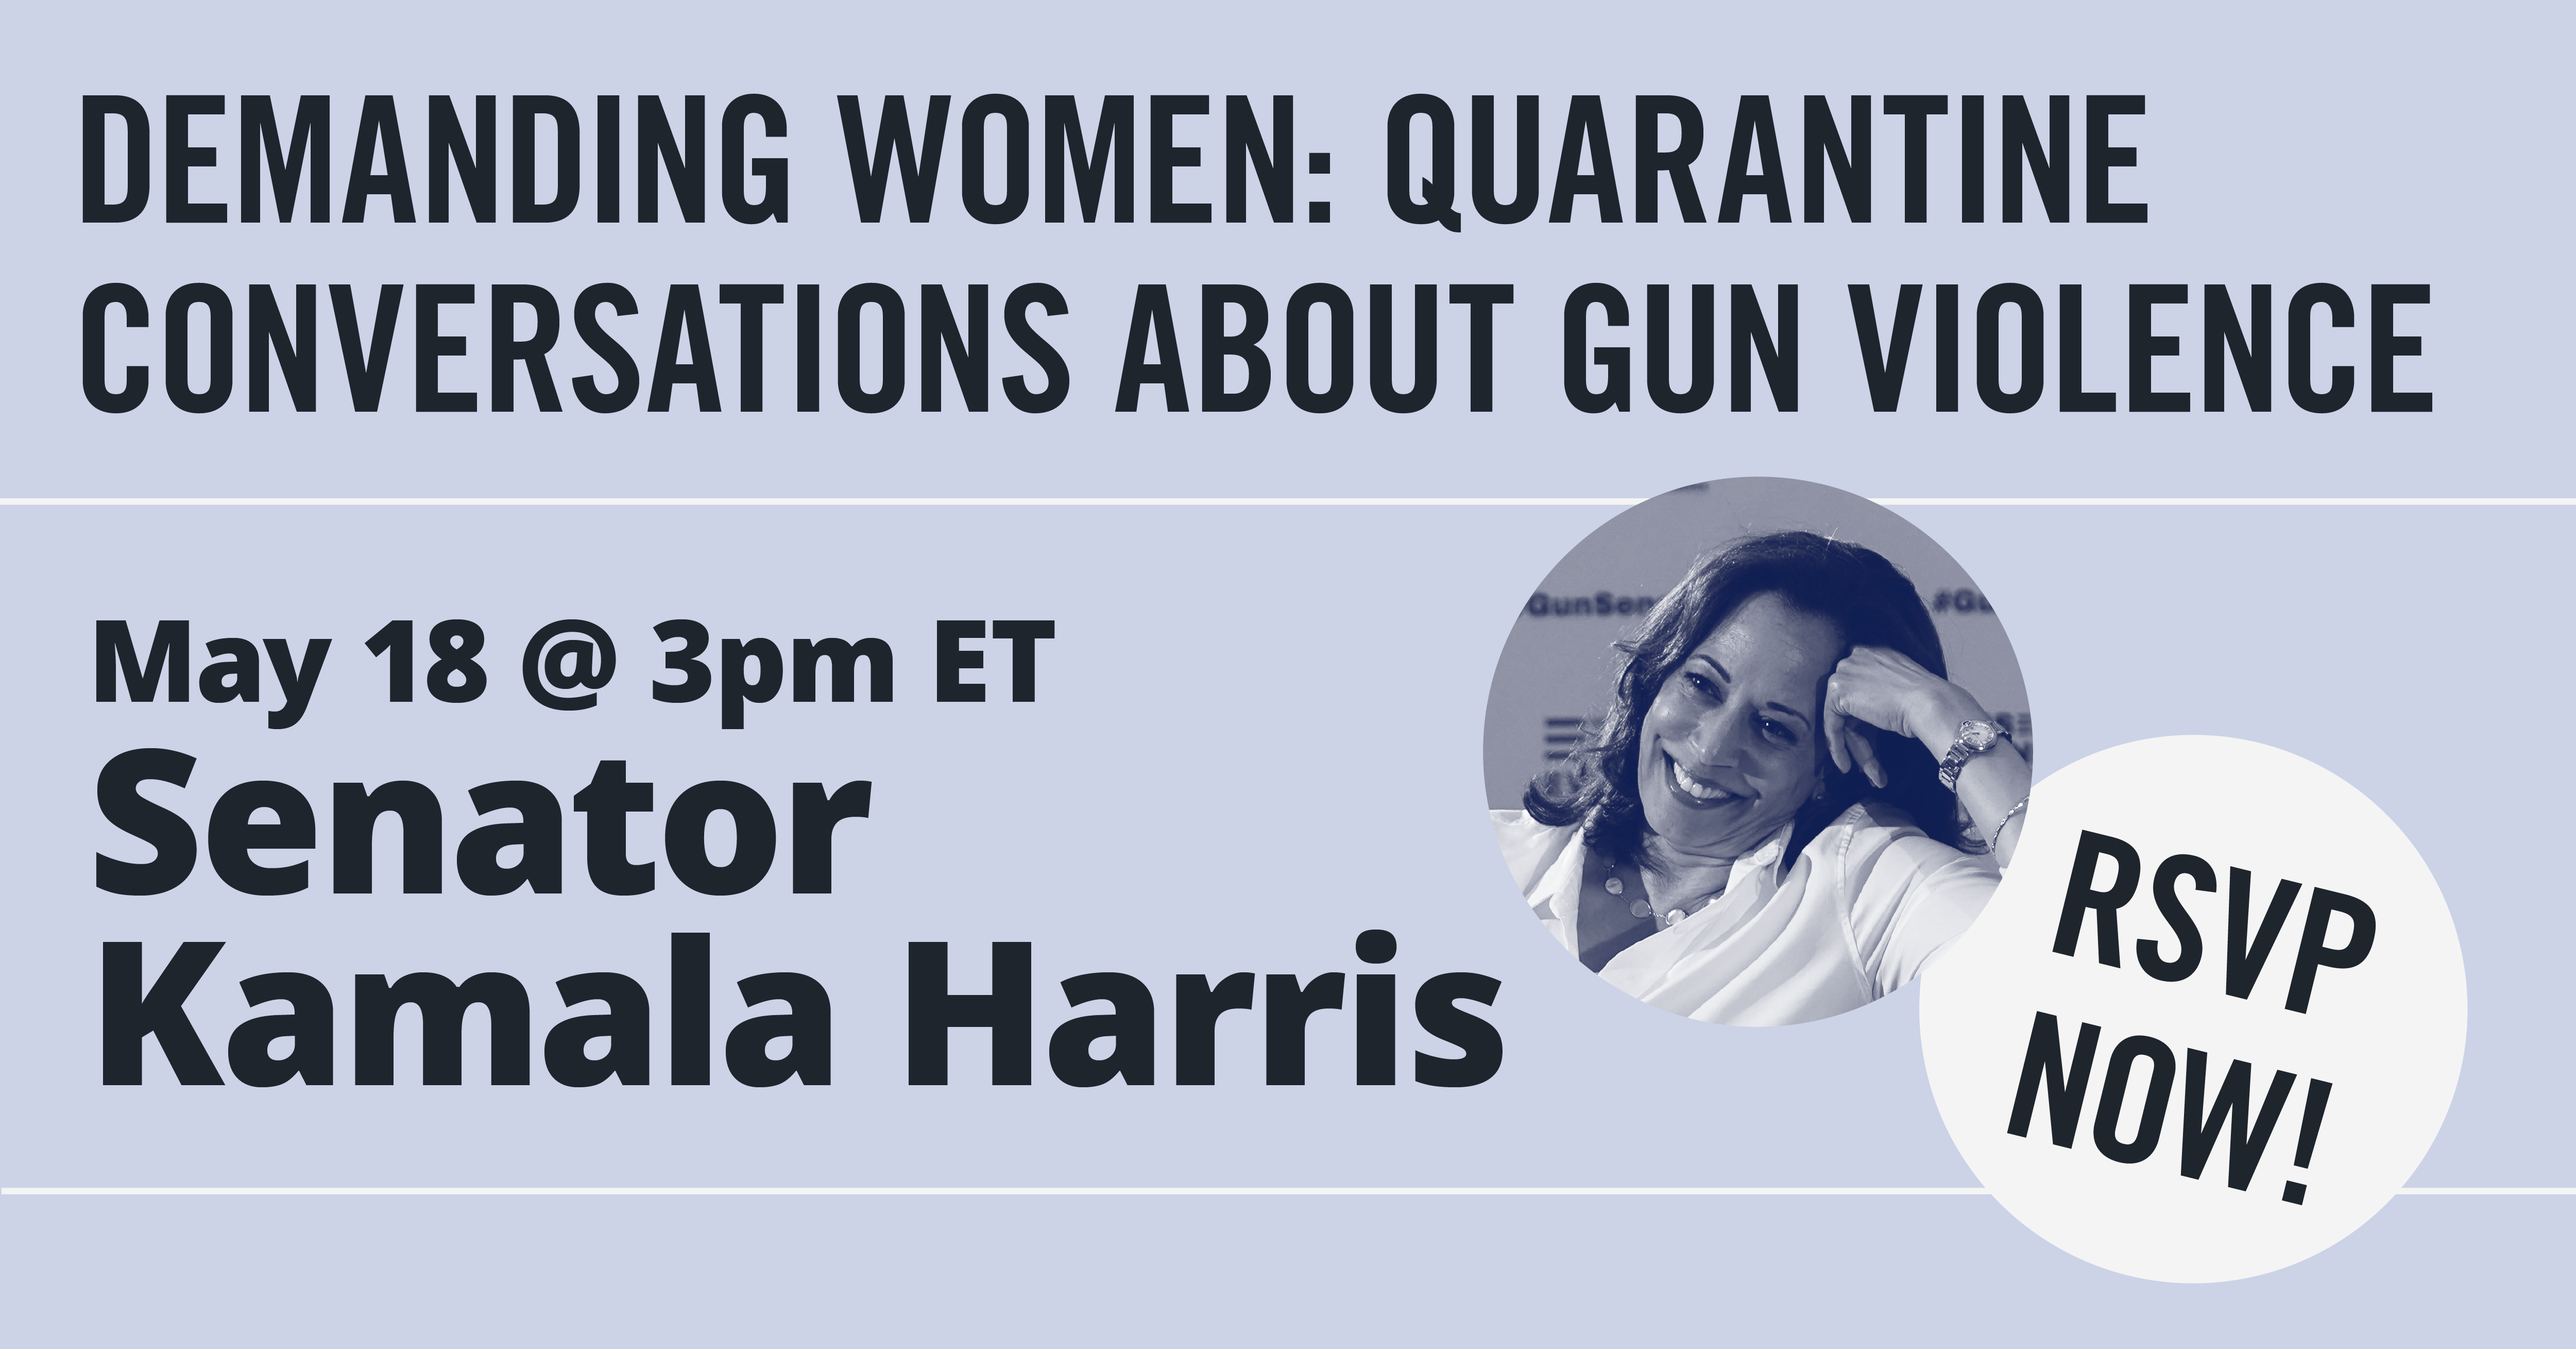 RSVP now for a conversation with Senator Kamala Harris